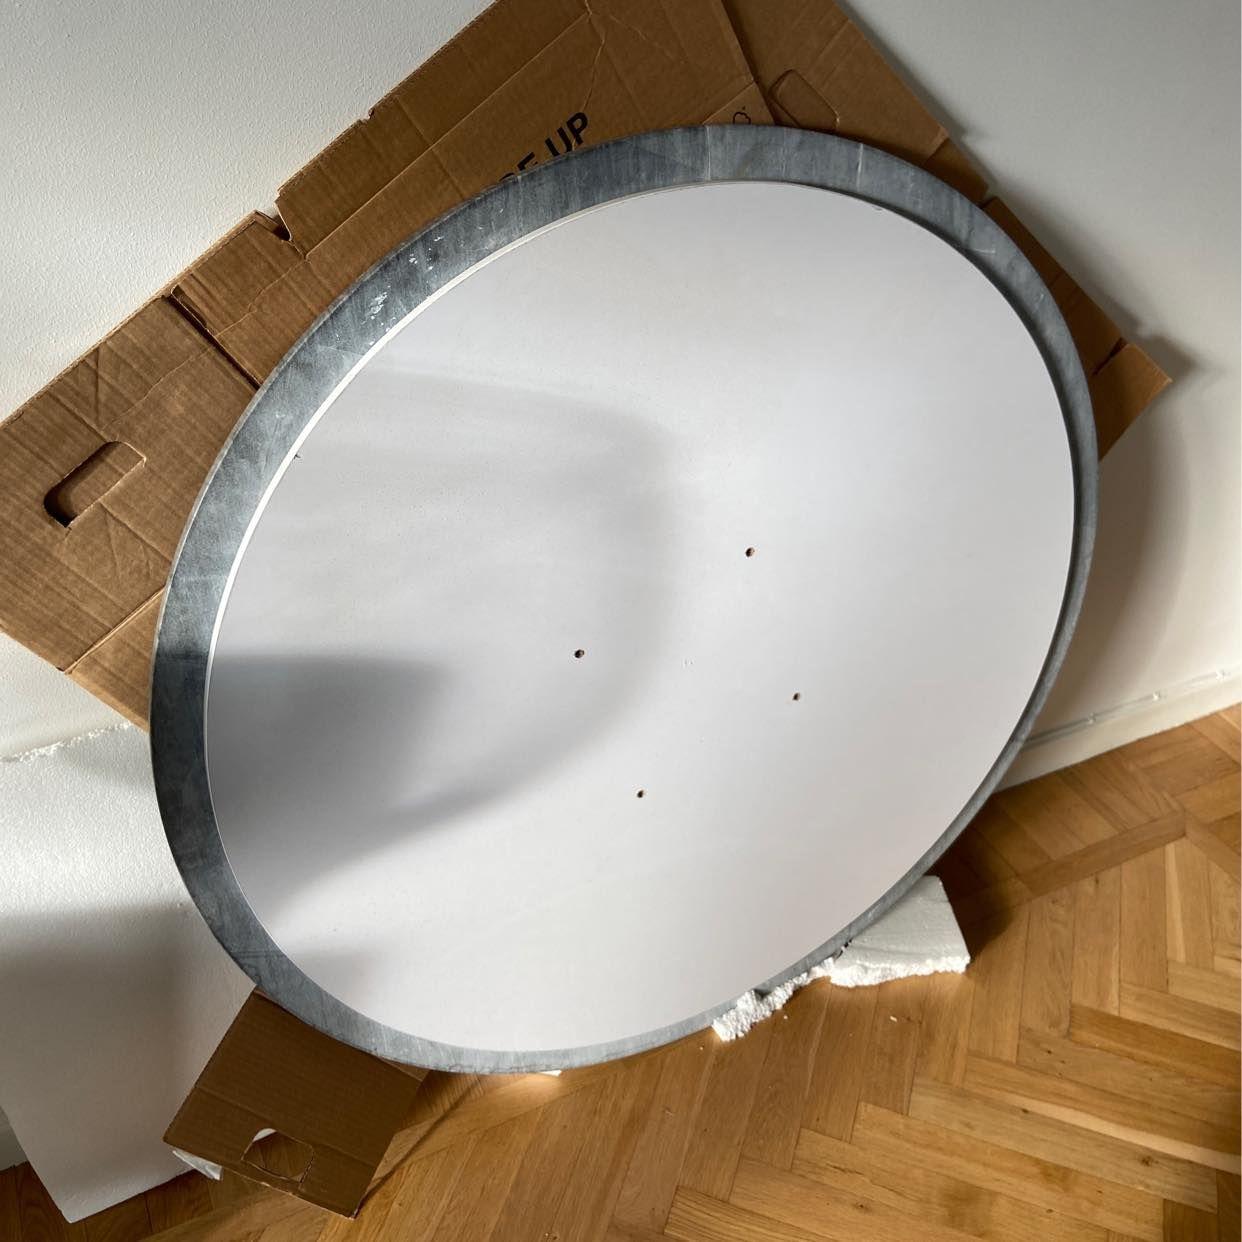 image of Hämtning utav bordsskiva - Johanneshov